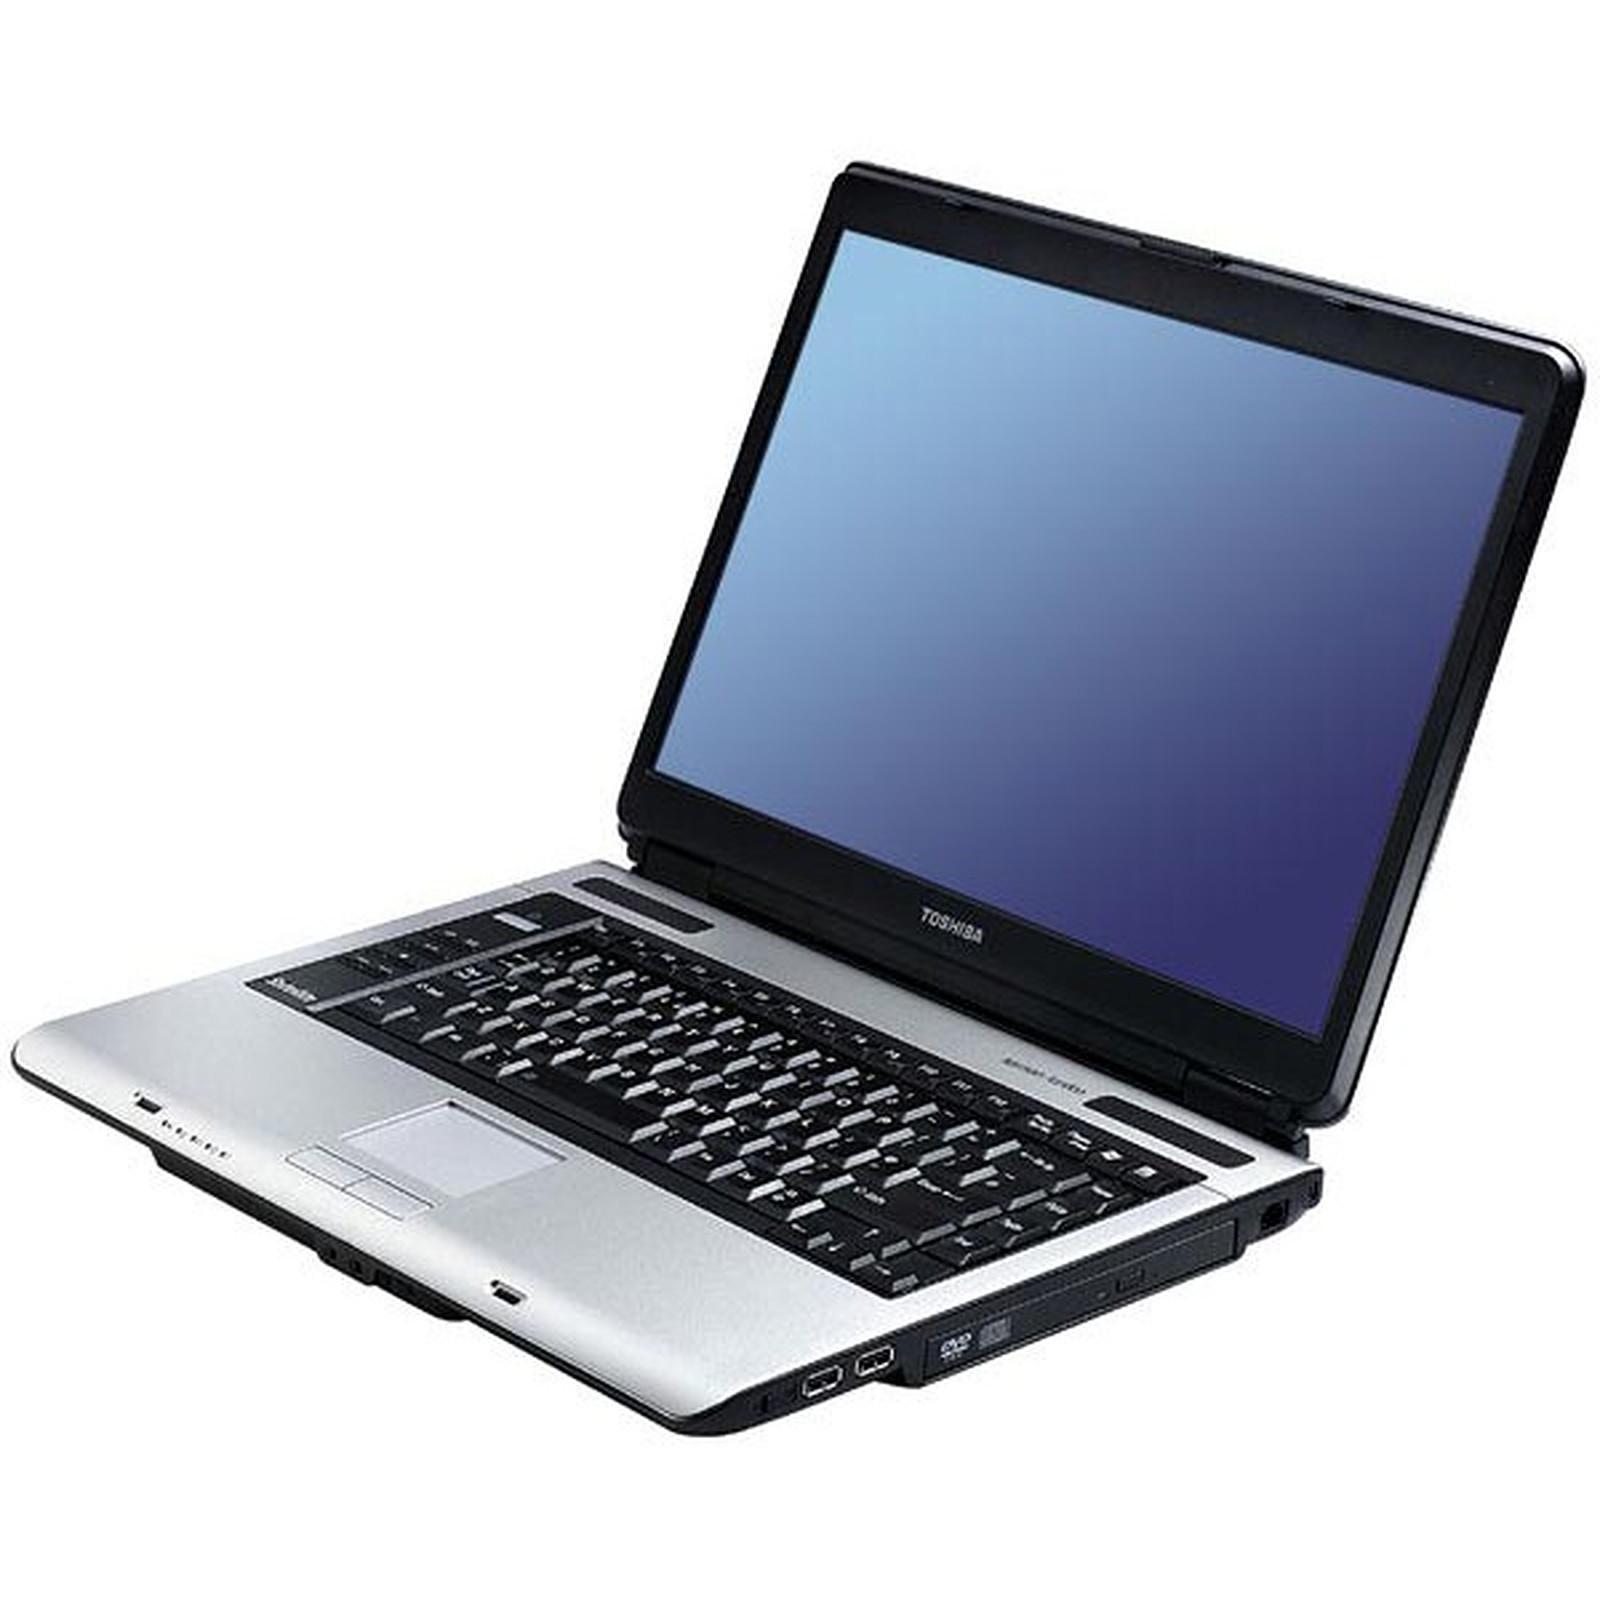 Toshiba Satellite A100-01X + Microsoft Office 2003 - Edition